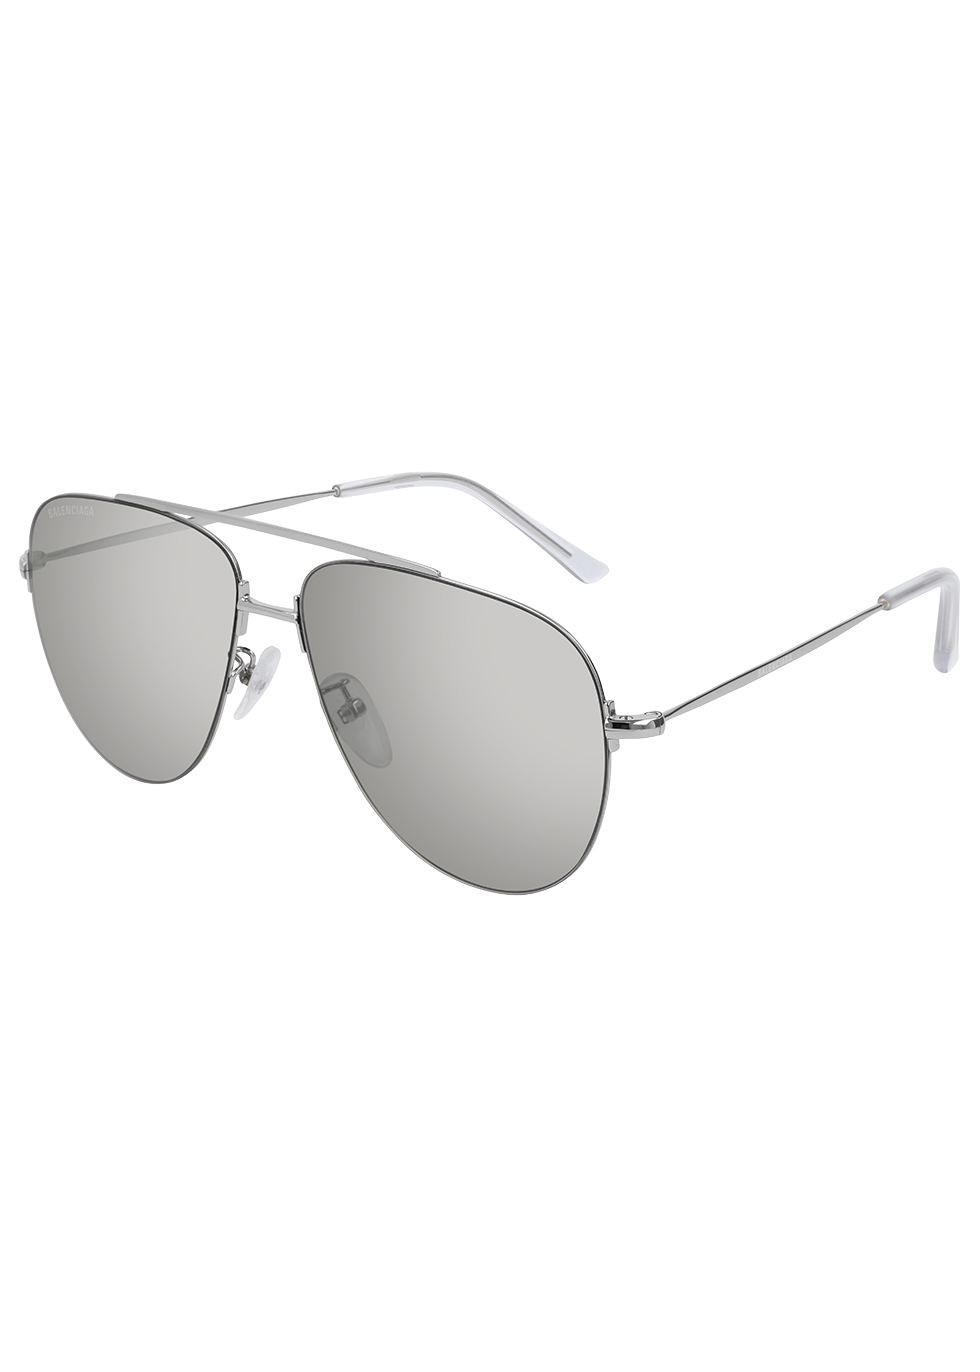 b3e2bf37b21 Men s Designer Sunglasses   Eyewear - Harvey Nichols